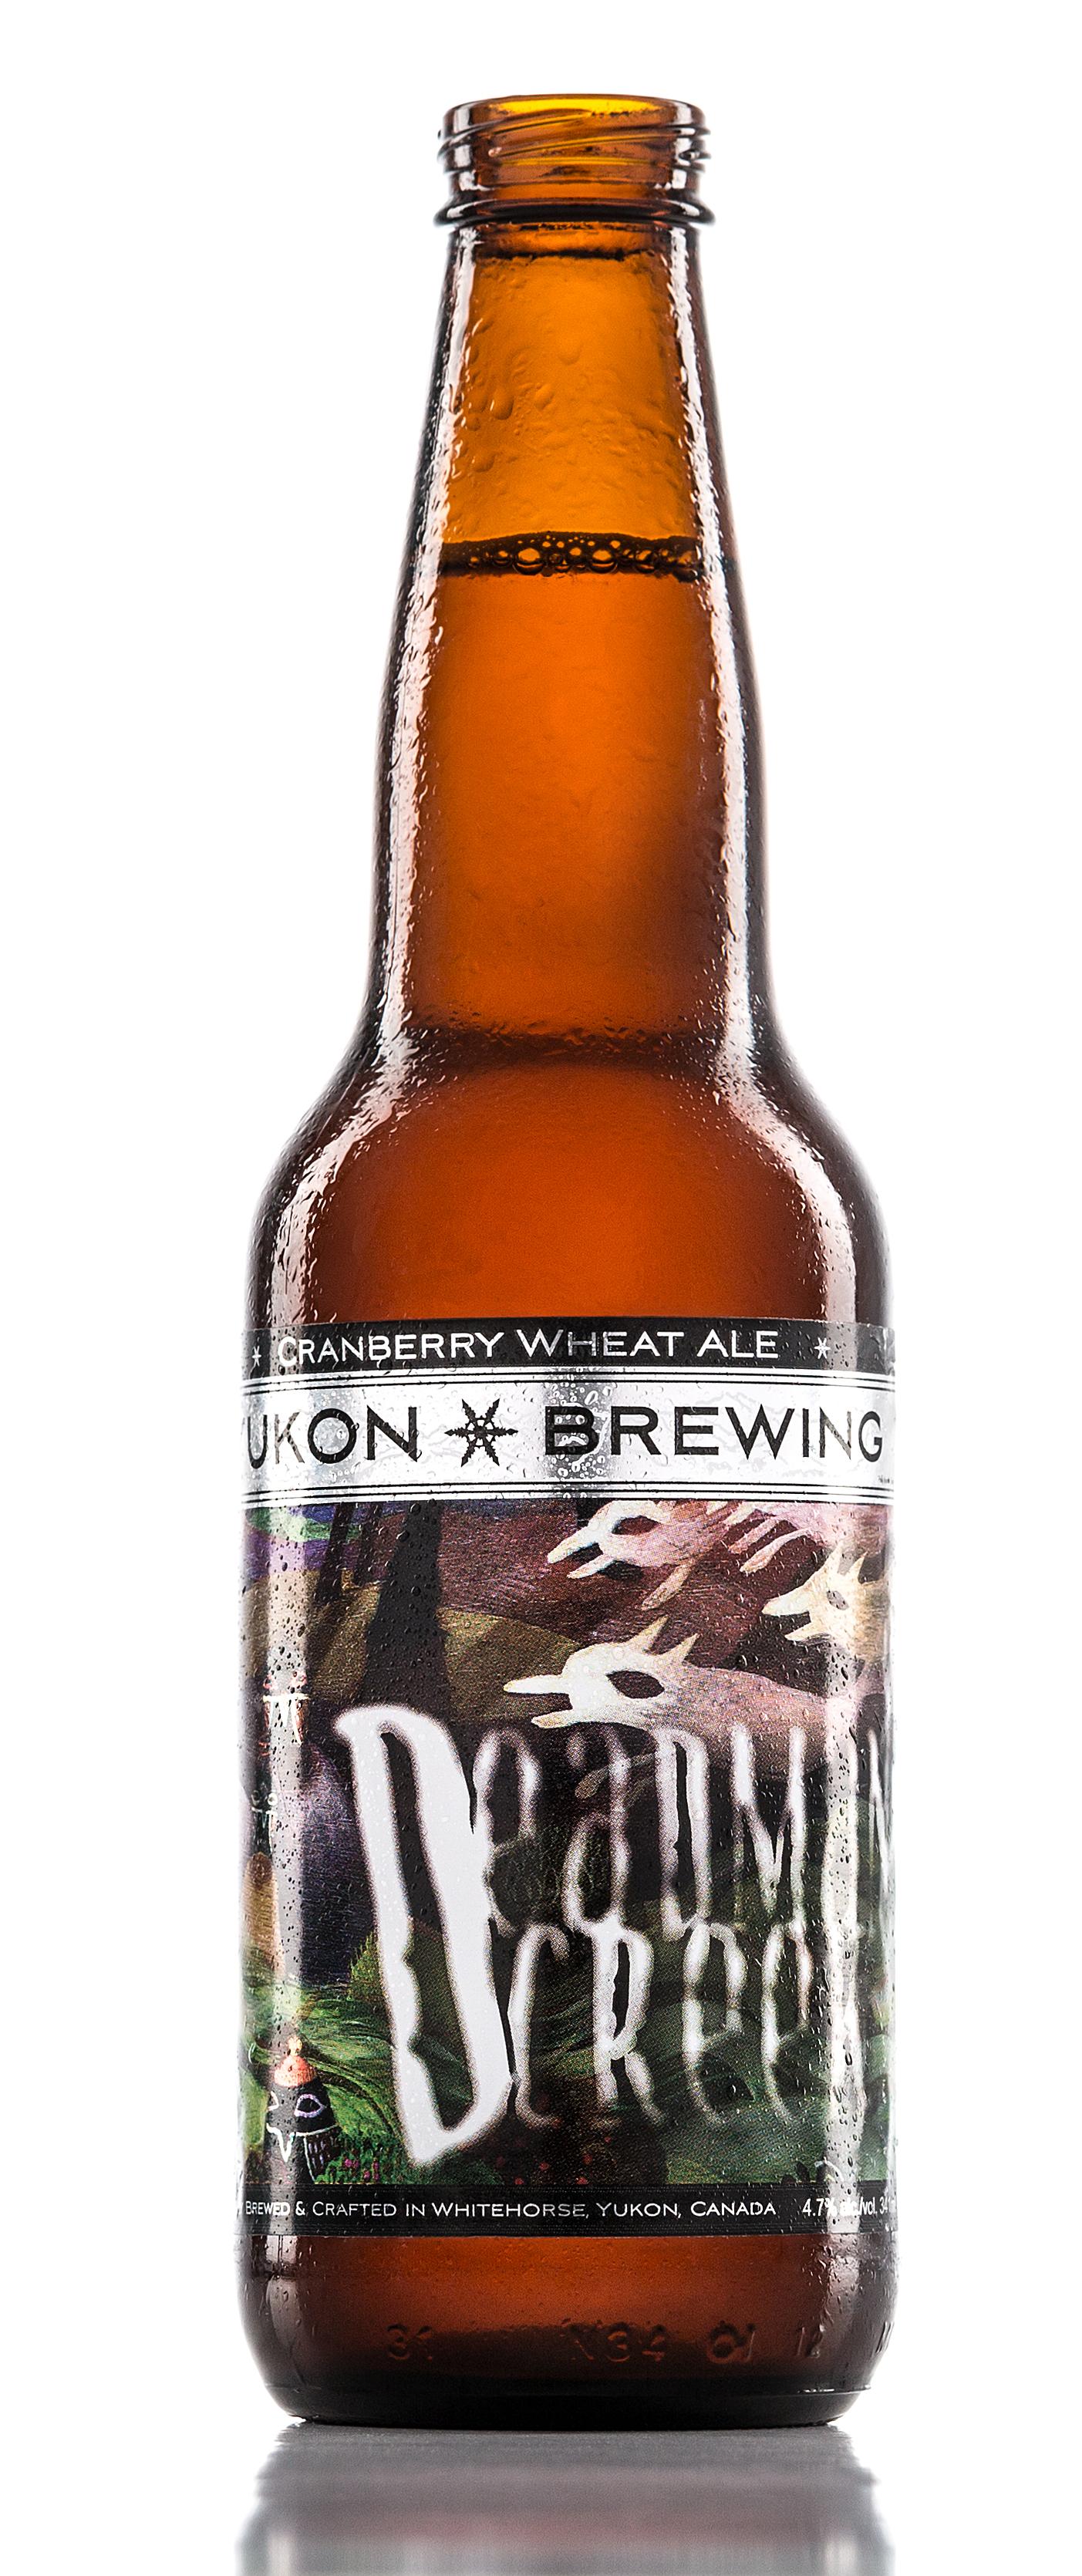 20140506_Yukon_Brewing_Products_GBP_010